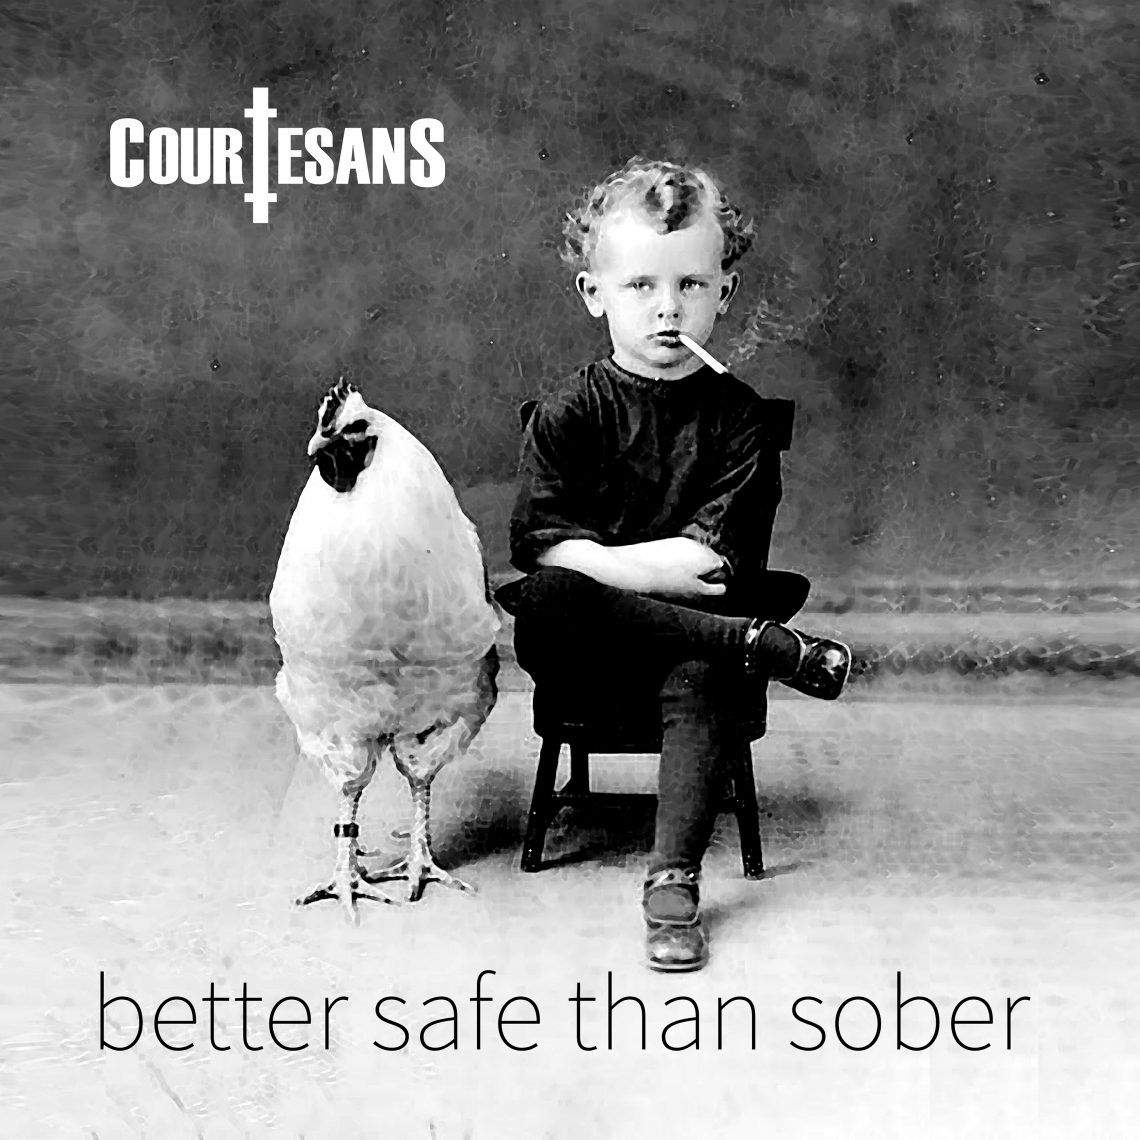 Courtesans – Better safe Than Sober – CD Review